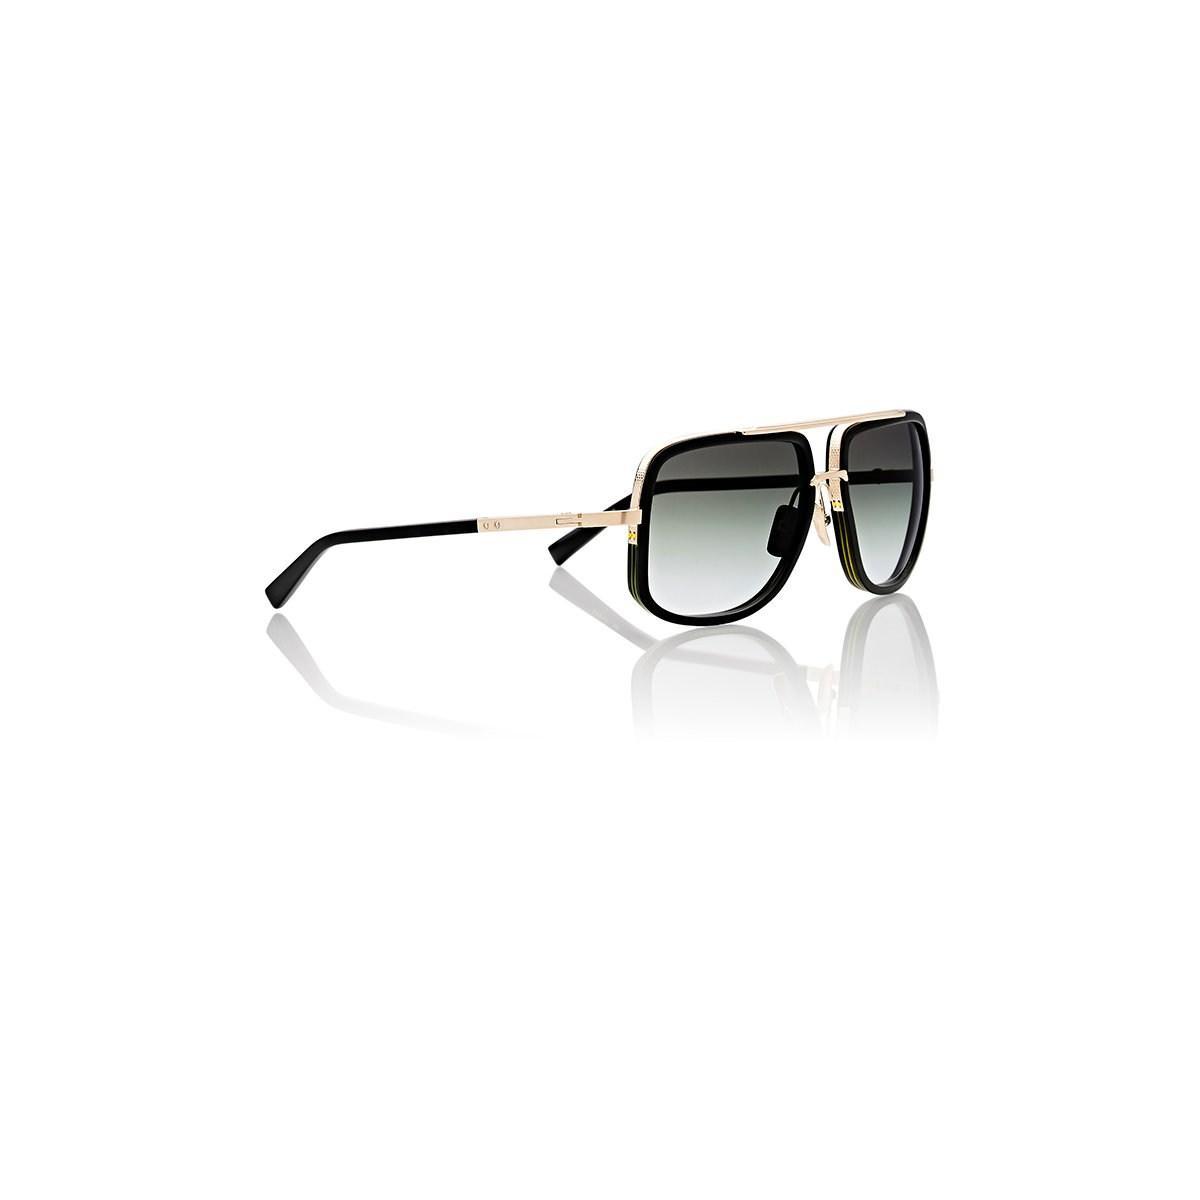 b0bebb714f74 Dita - Black Mach One Sunglasses for Men - Lyst. View fullscreen